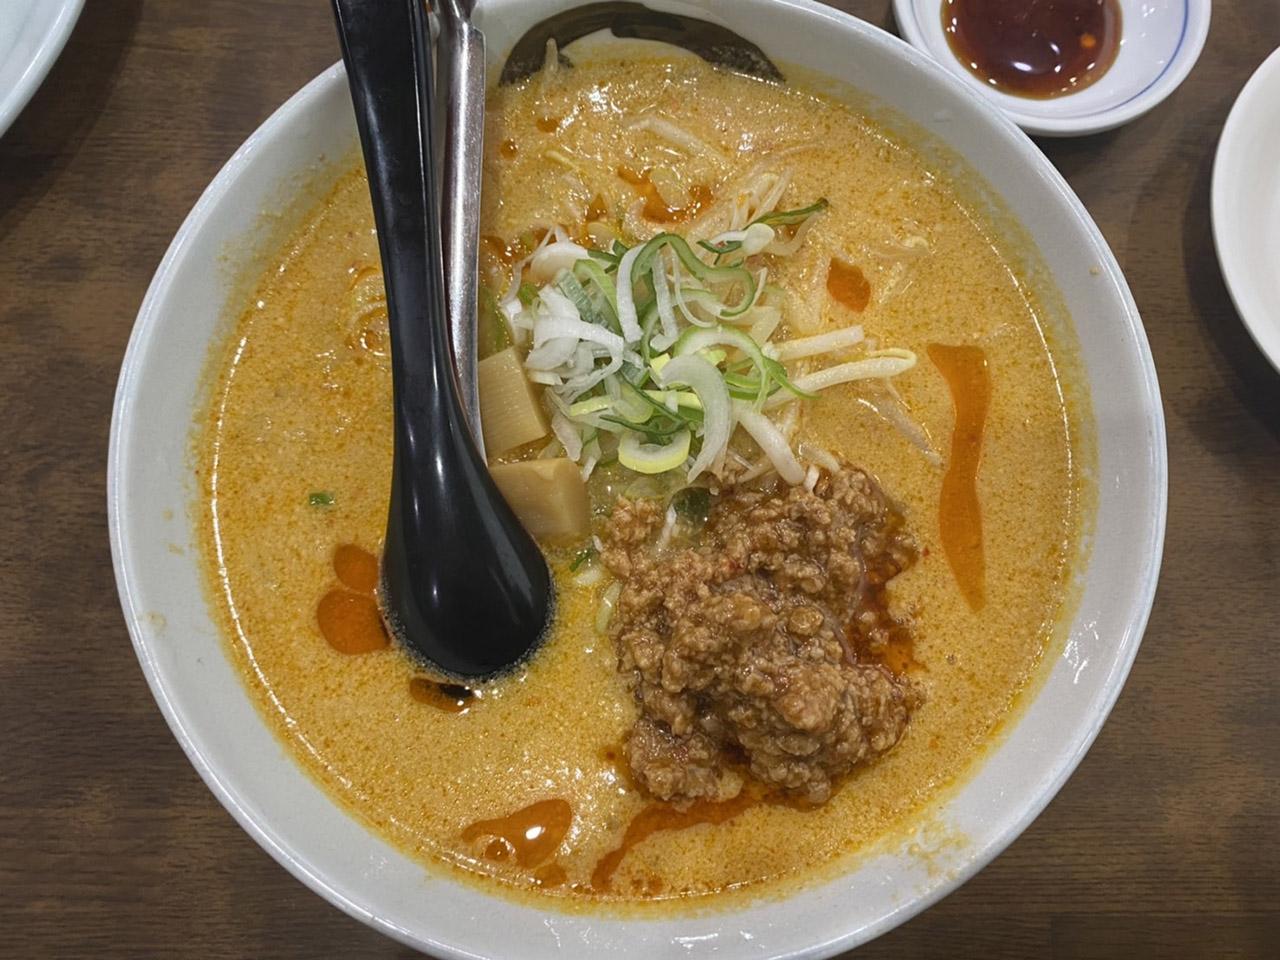 味噌担々麺の写真